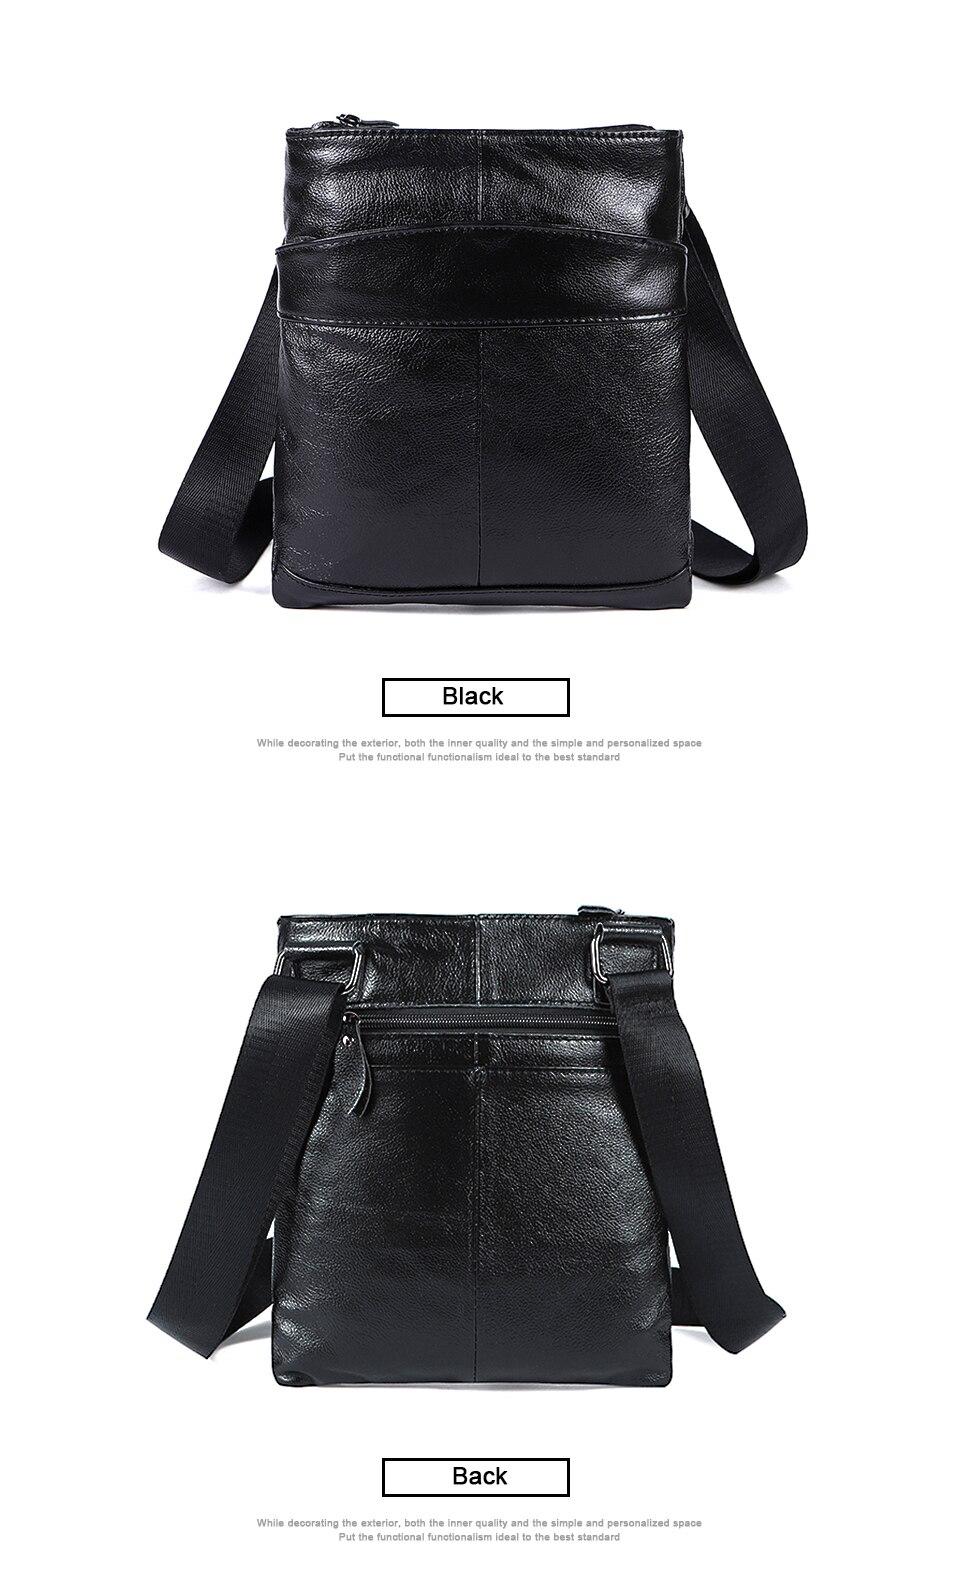 Genuine Leather Men Bag Men Messenger Bags Fashion ipad Flap Crossbody Bags Small Casual Men's Leather Shoulder Bag Man (6)